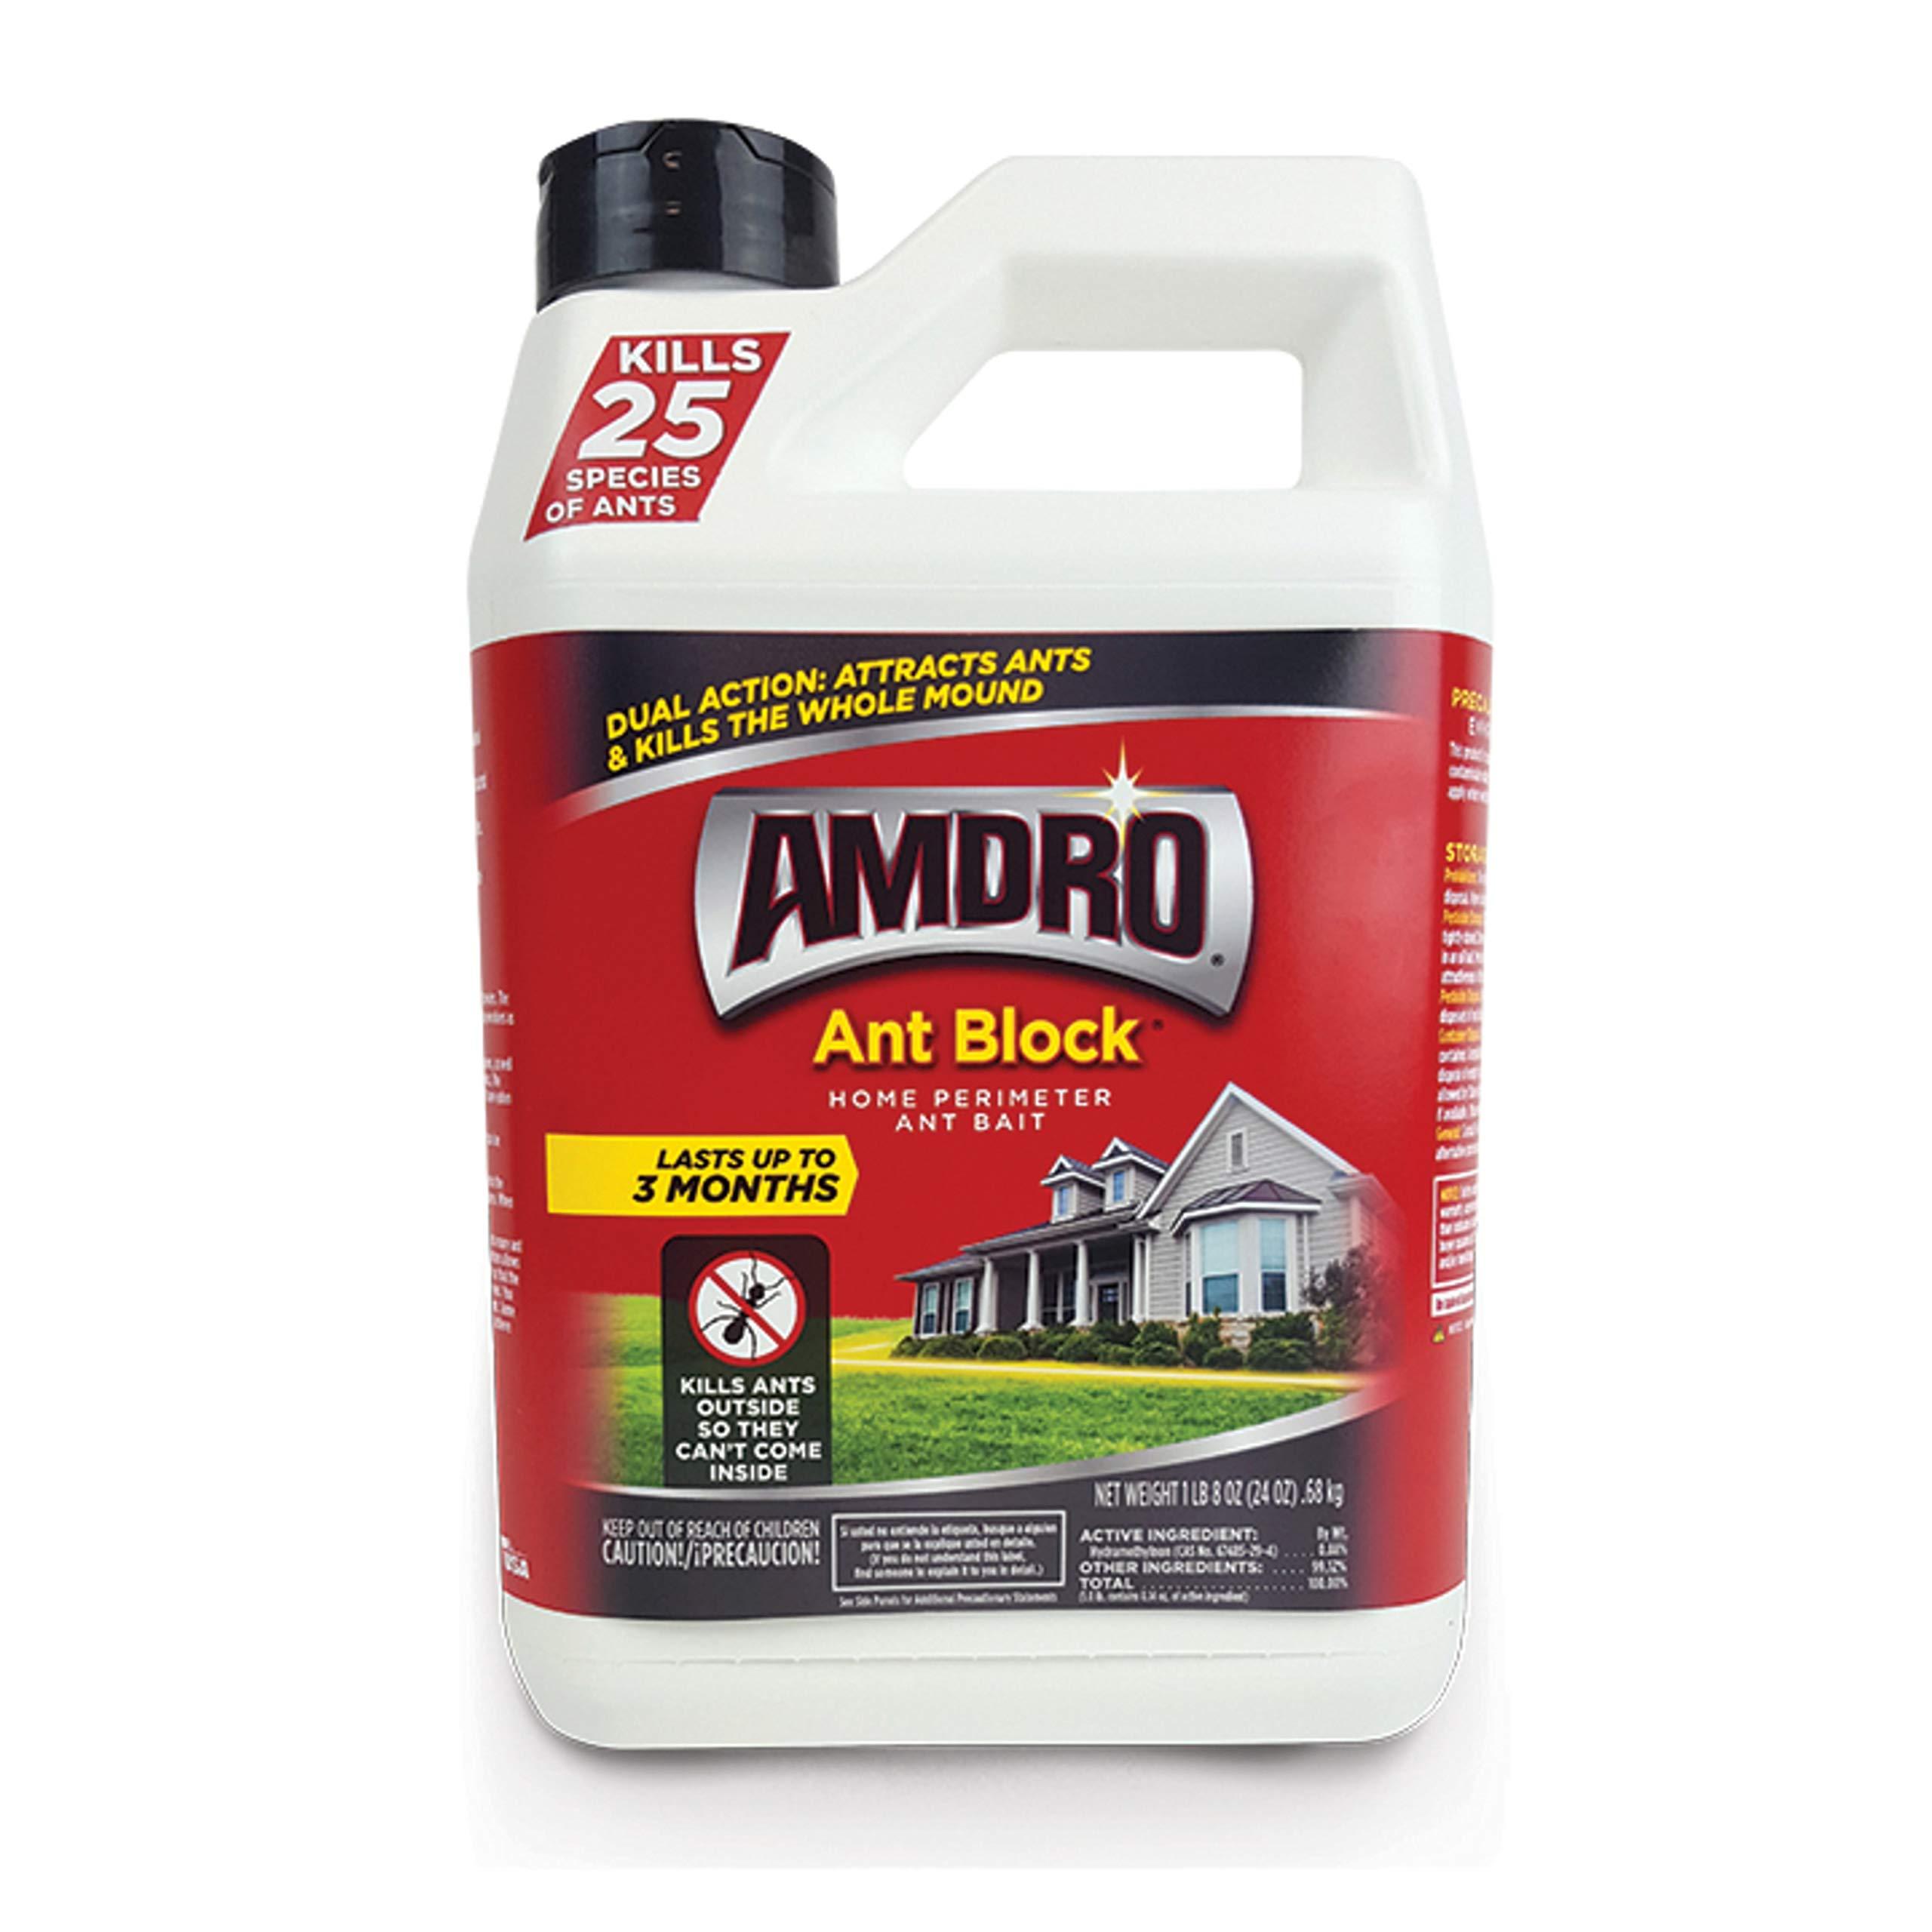 Amdro 100099216 Ant Block Granule, 24 Ounces